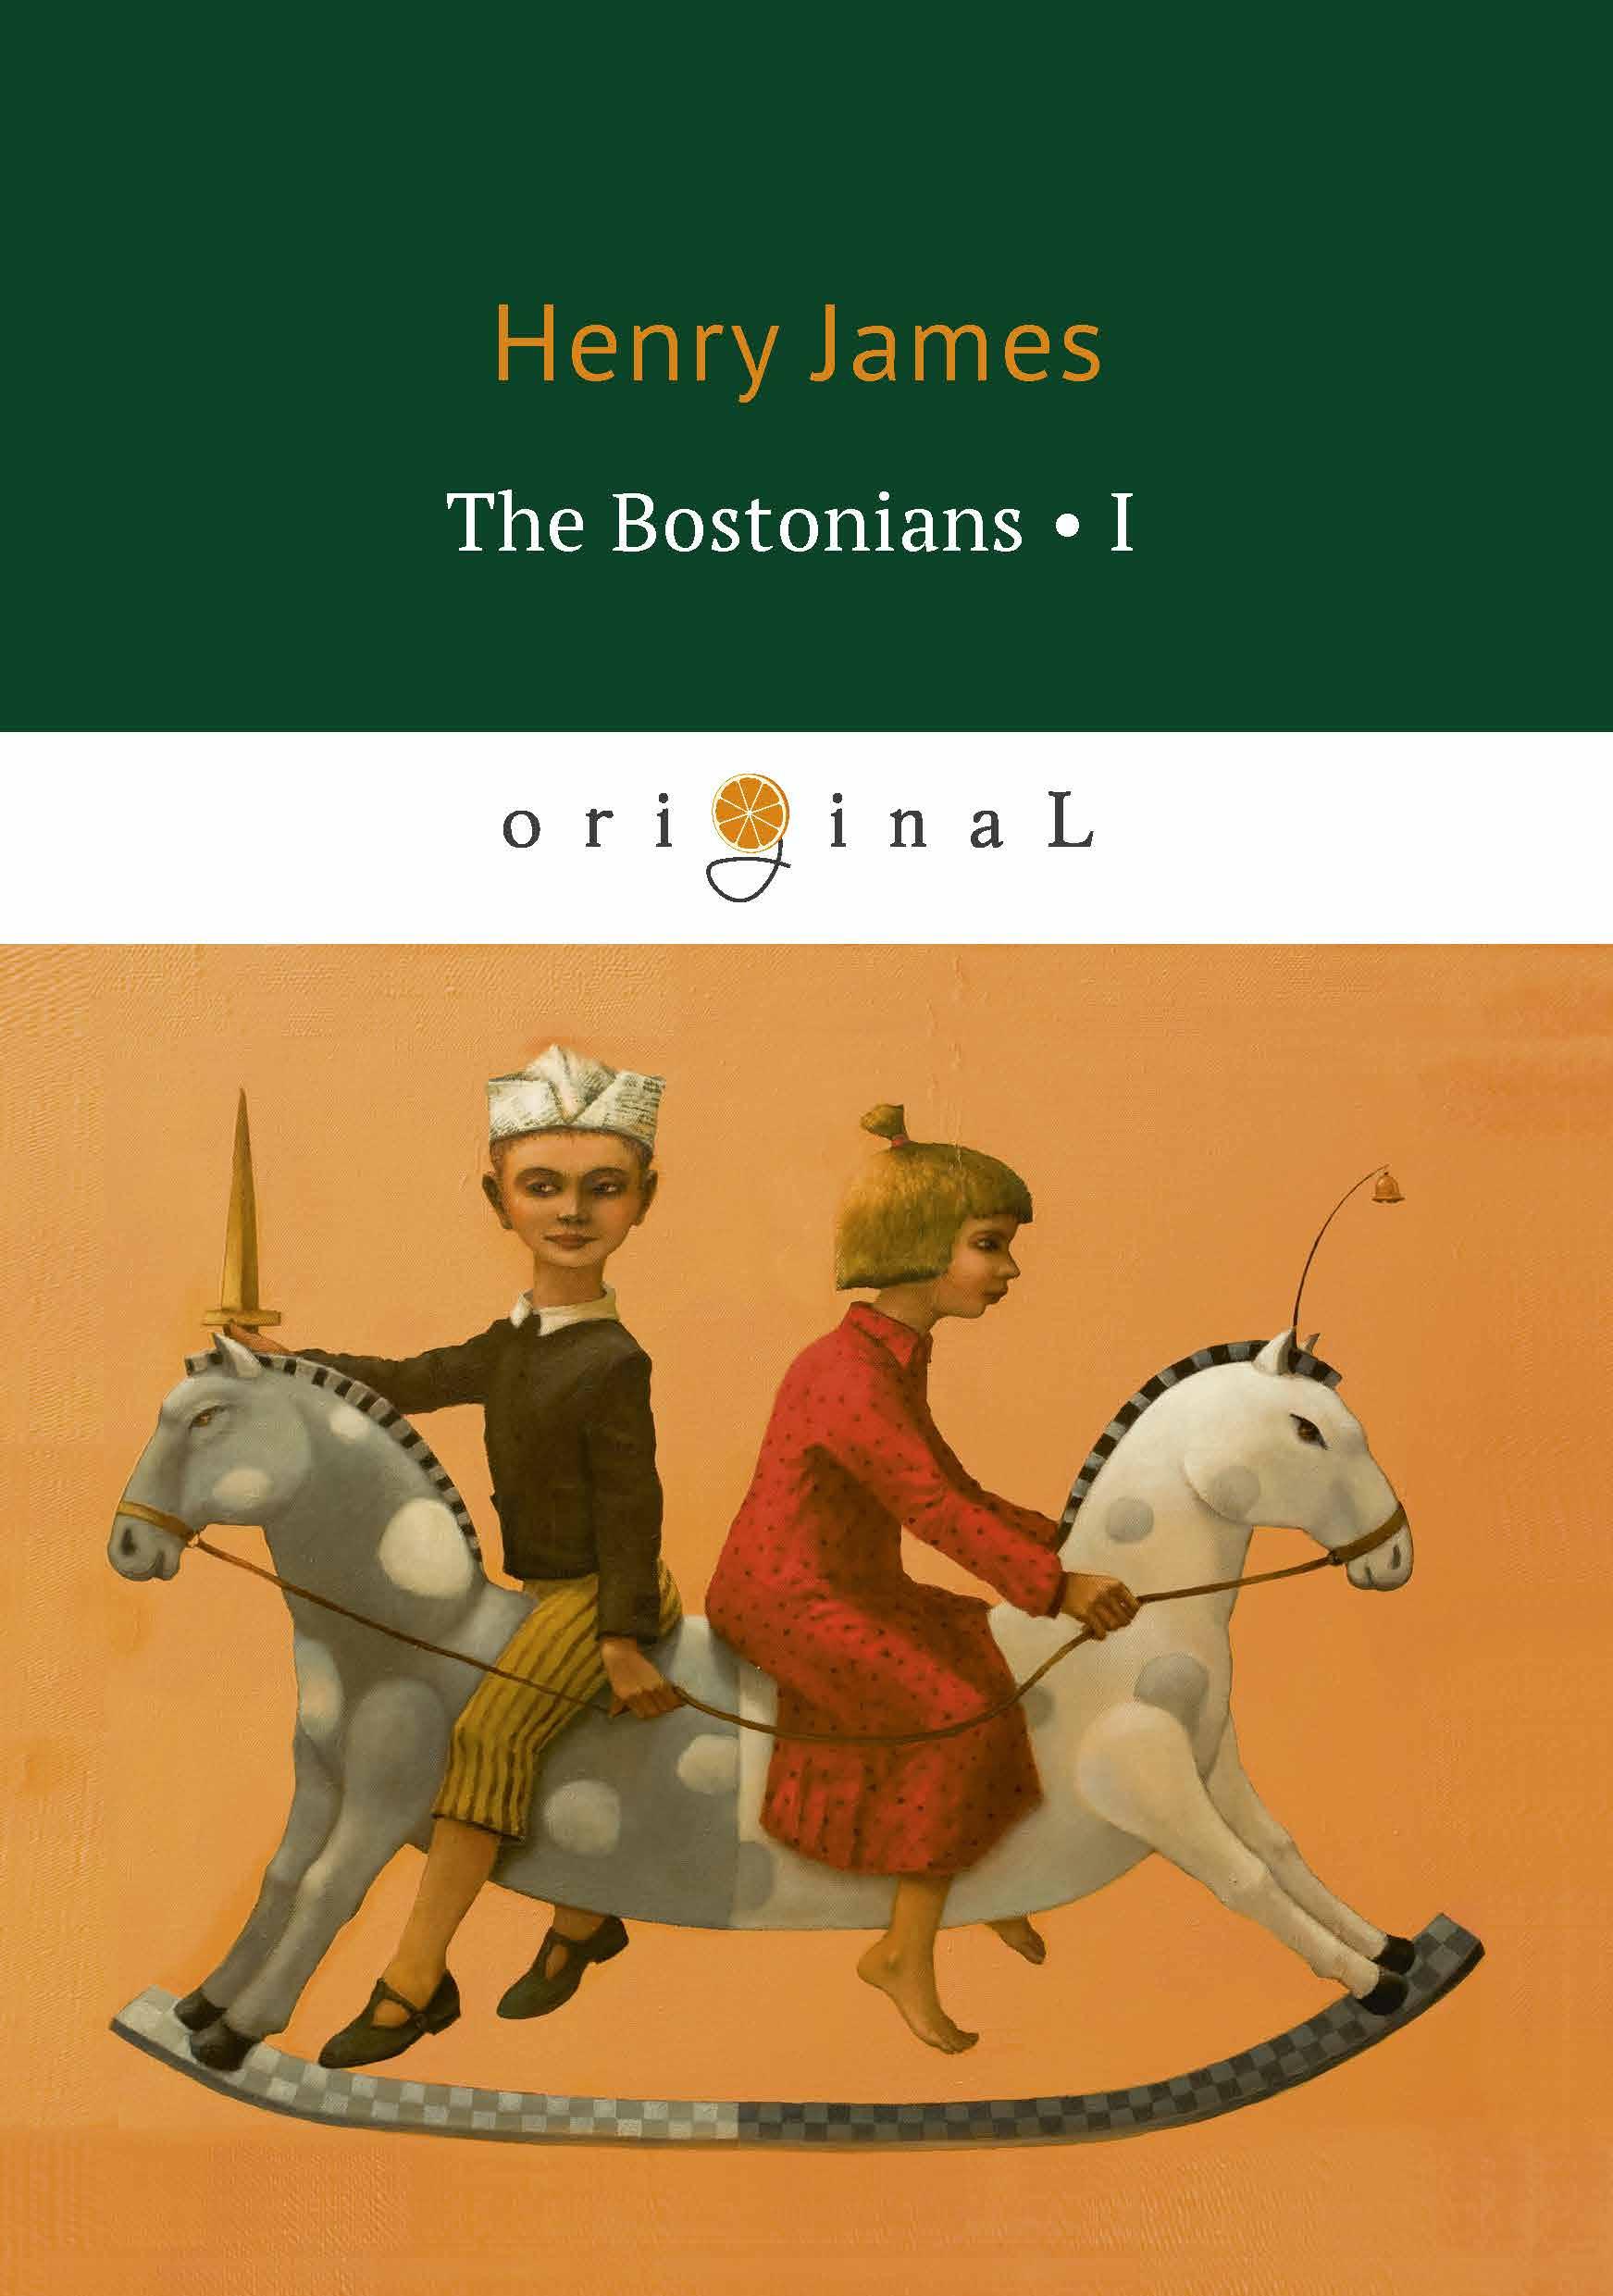 лучшая цена Henry James The Bostonians I